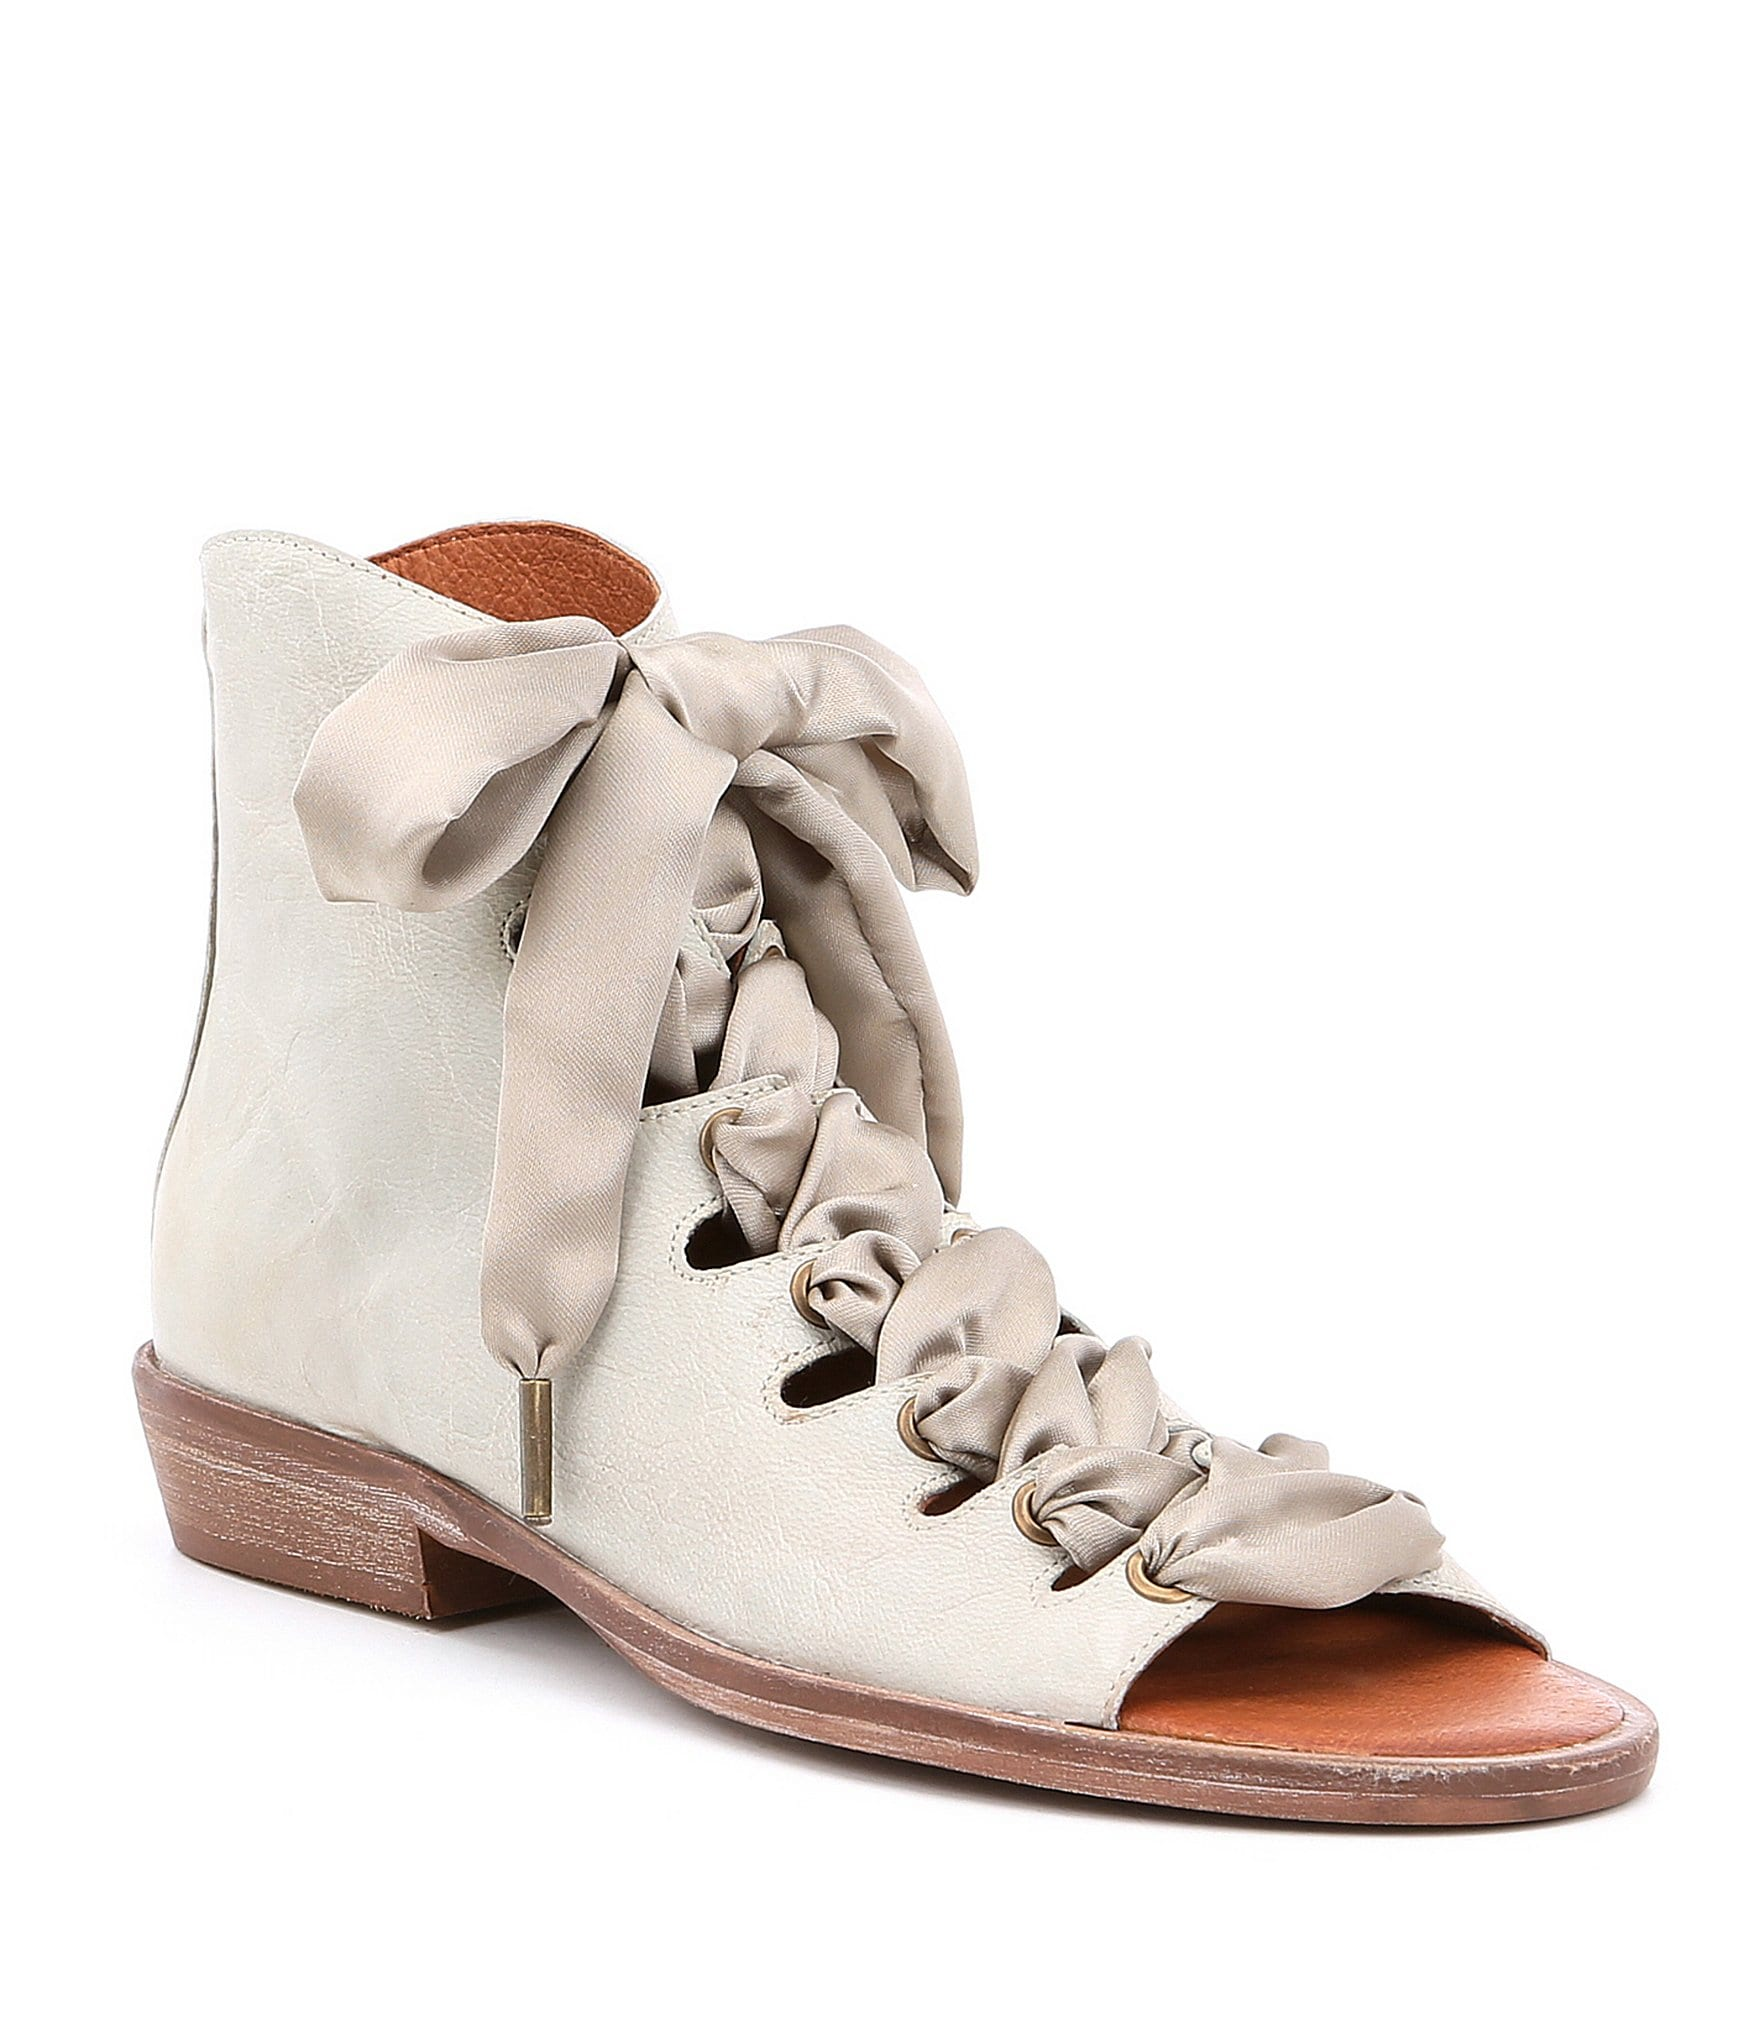 Palms Lace Up Gladiator Block Heel Sandals tuW6OV